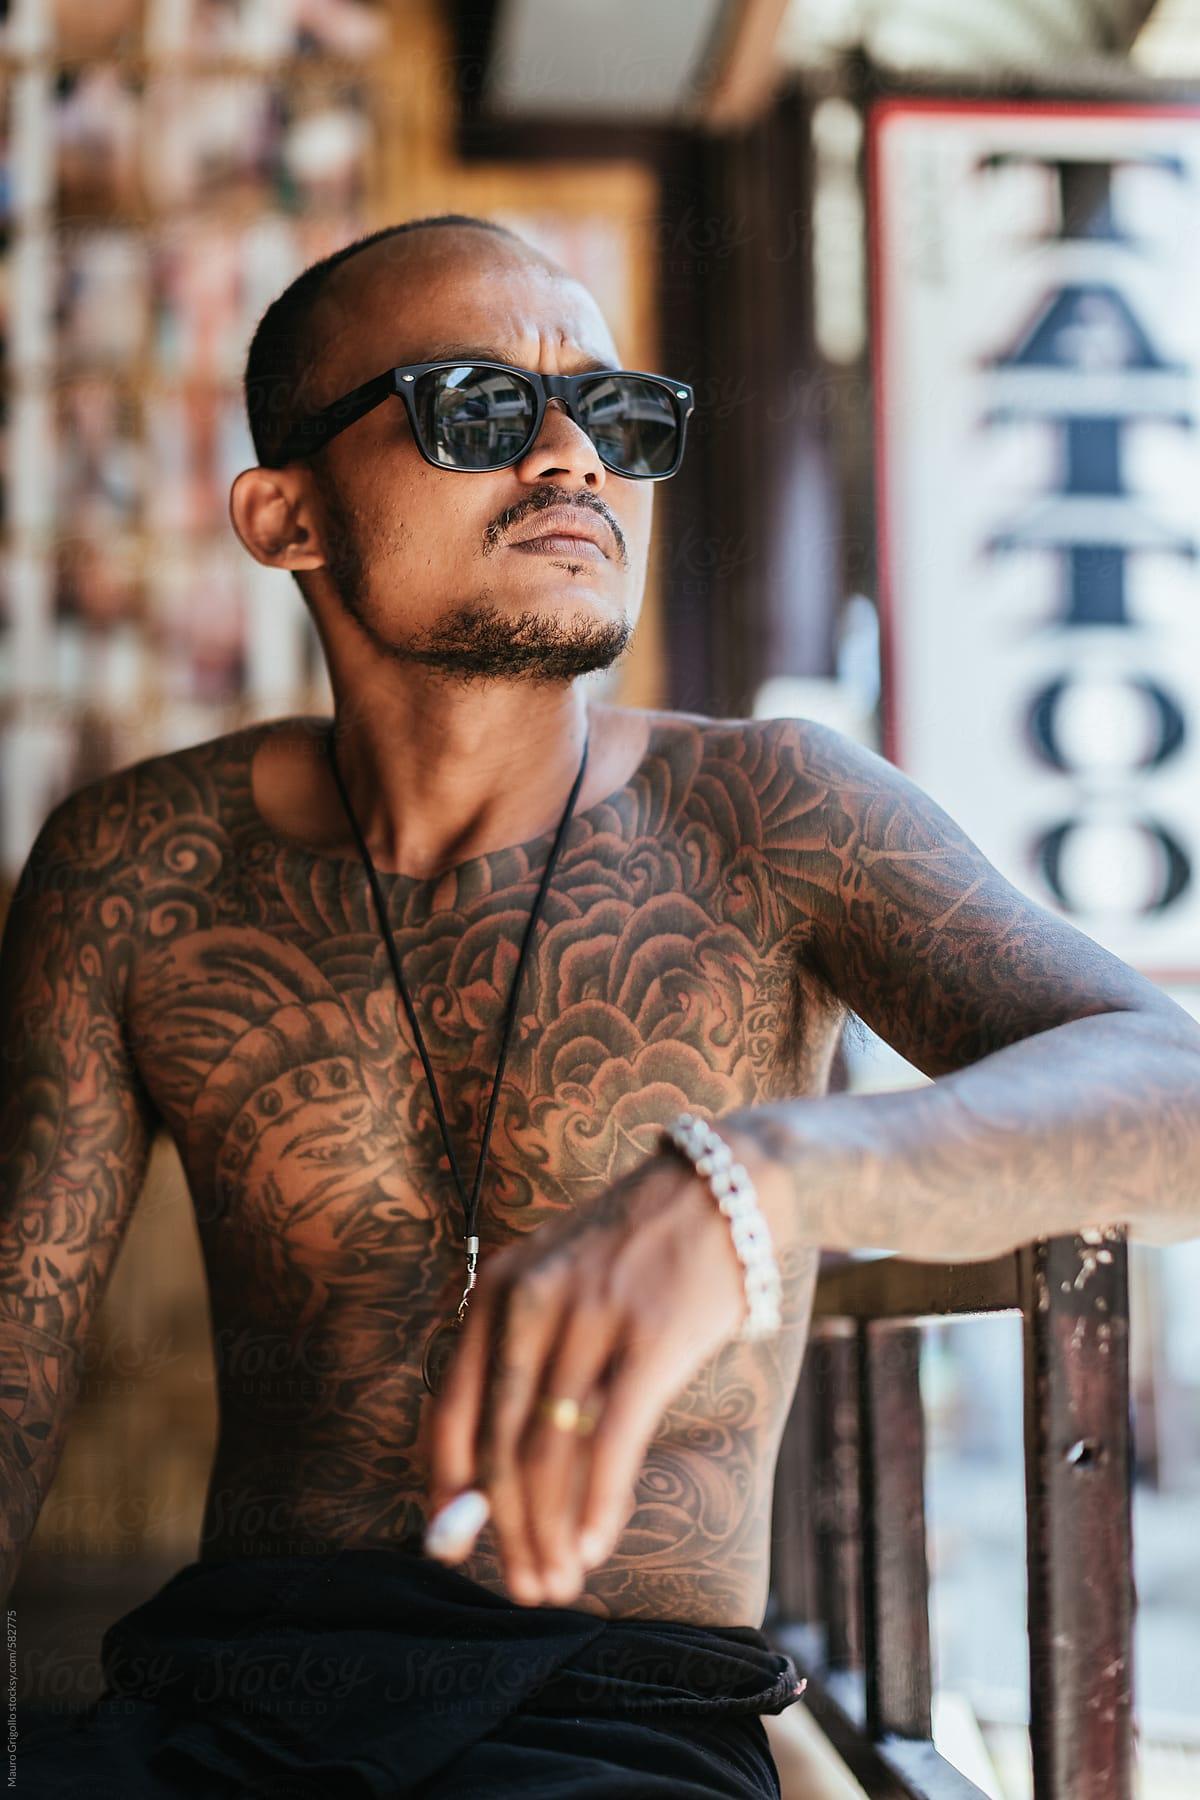 Thai Tattoo Artist Smoking A Cigarette During A Break By